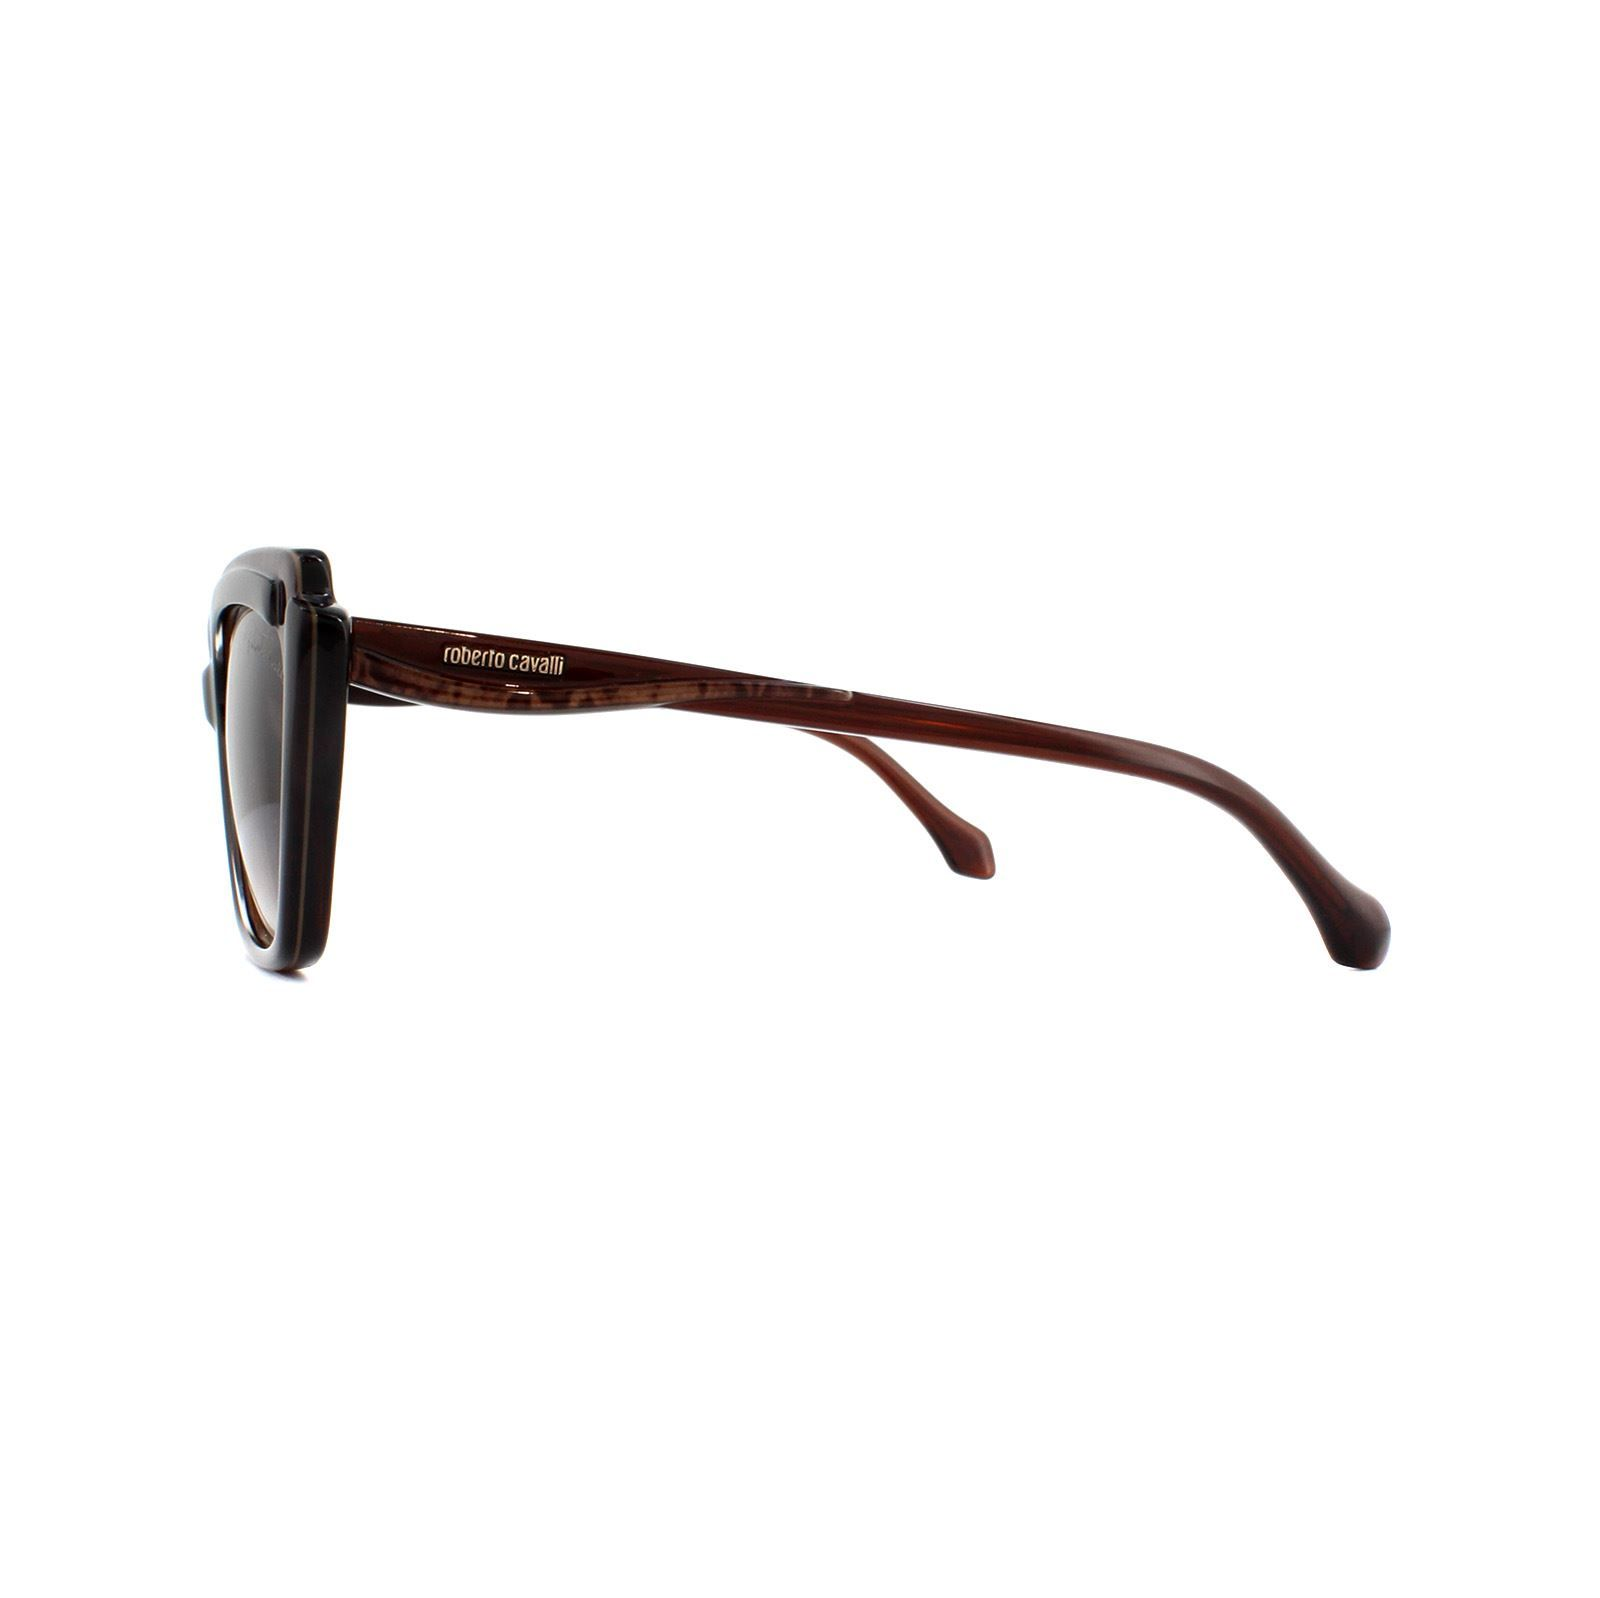 Roberto Cavalli Sunglasses Chiusi RC1051 50F Dark Brown Brown Gradient